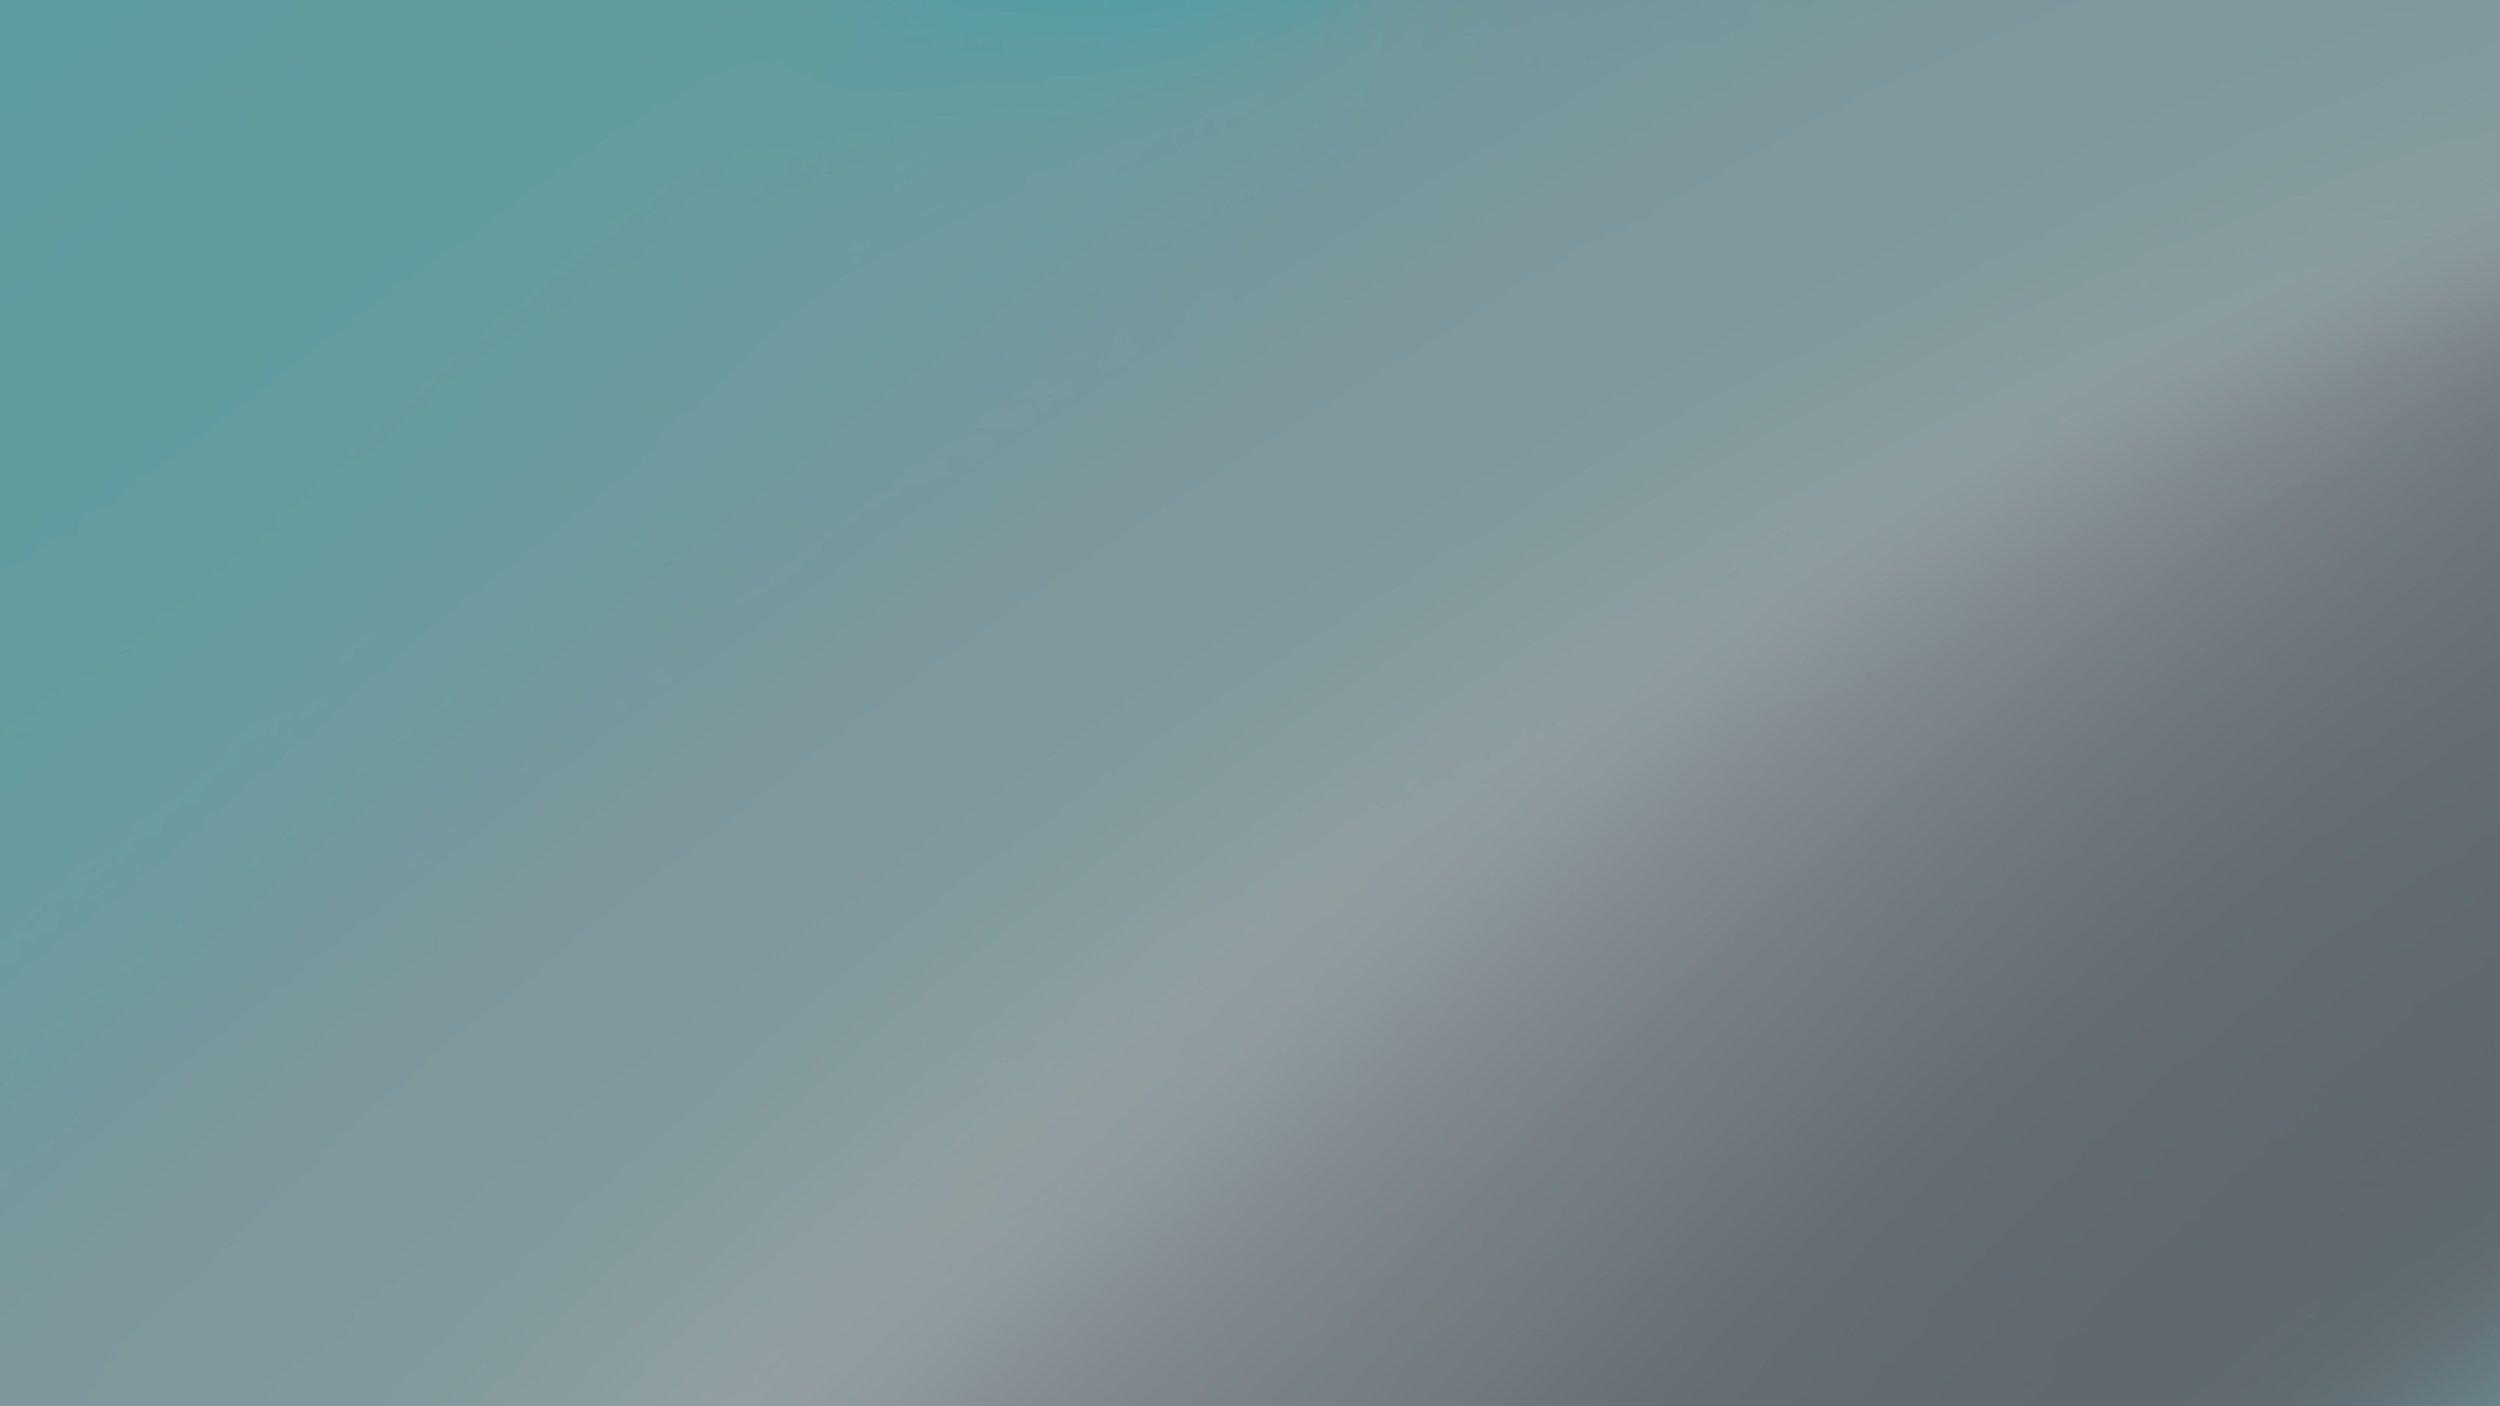 Minimal-Wallpaper-Gradient-for-Mac-Daniel-Romero-rmrdnl-1.jpg